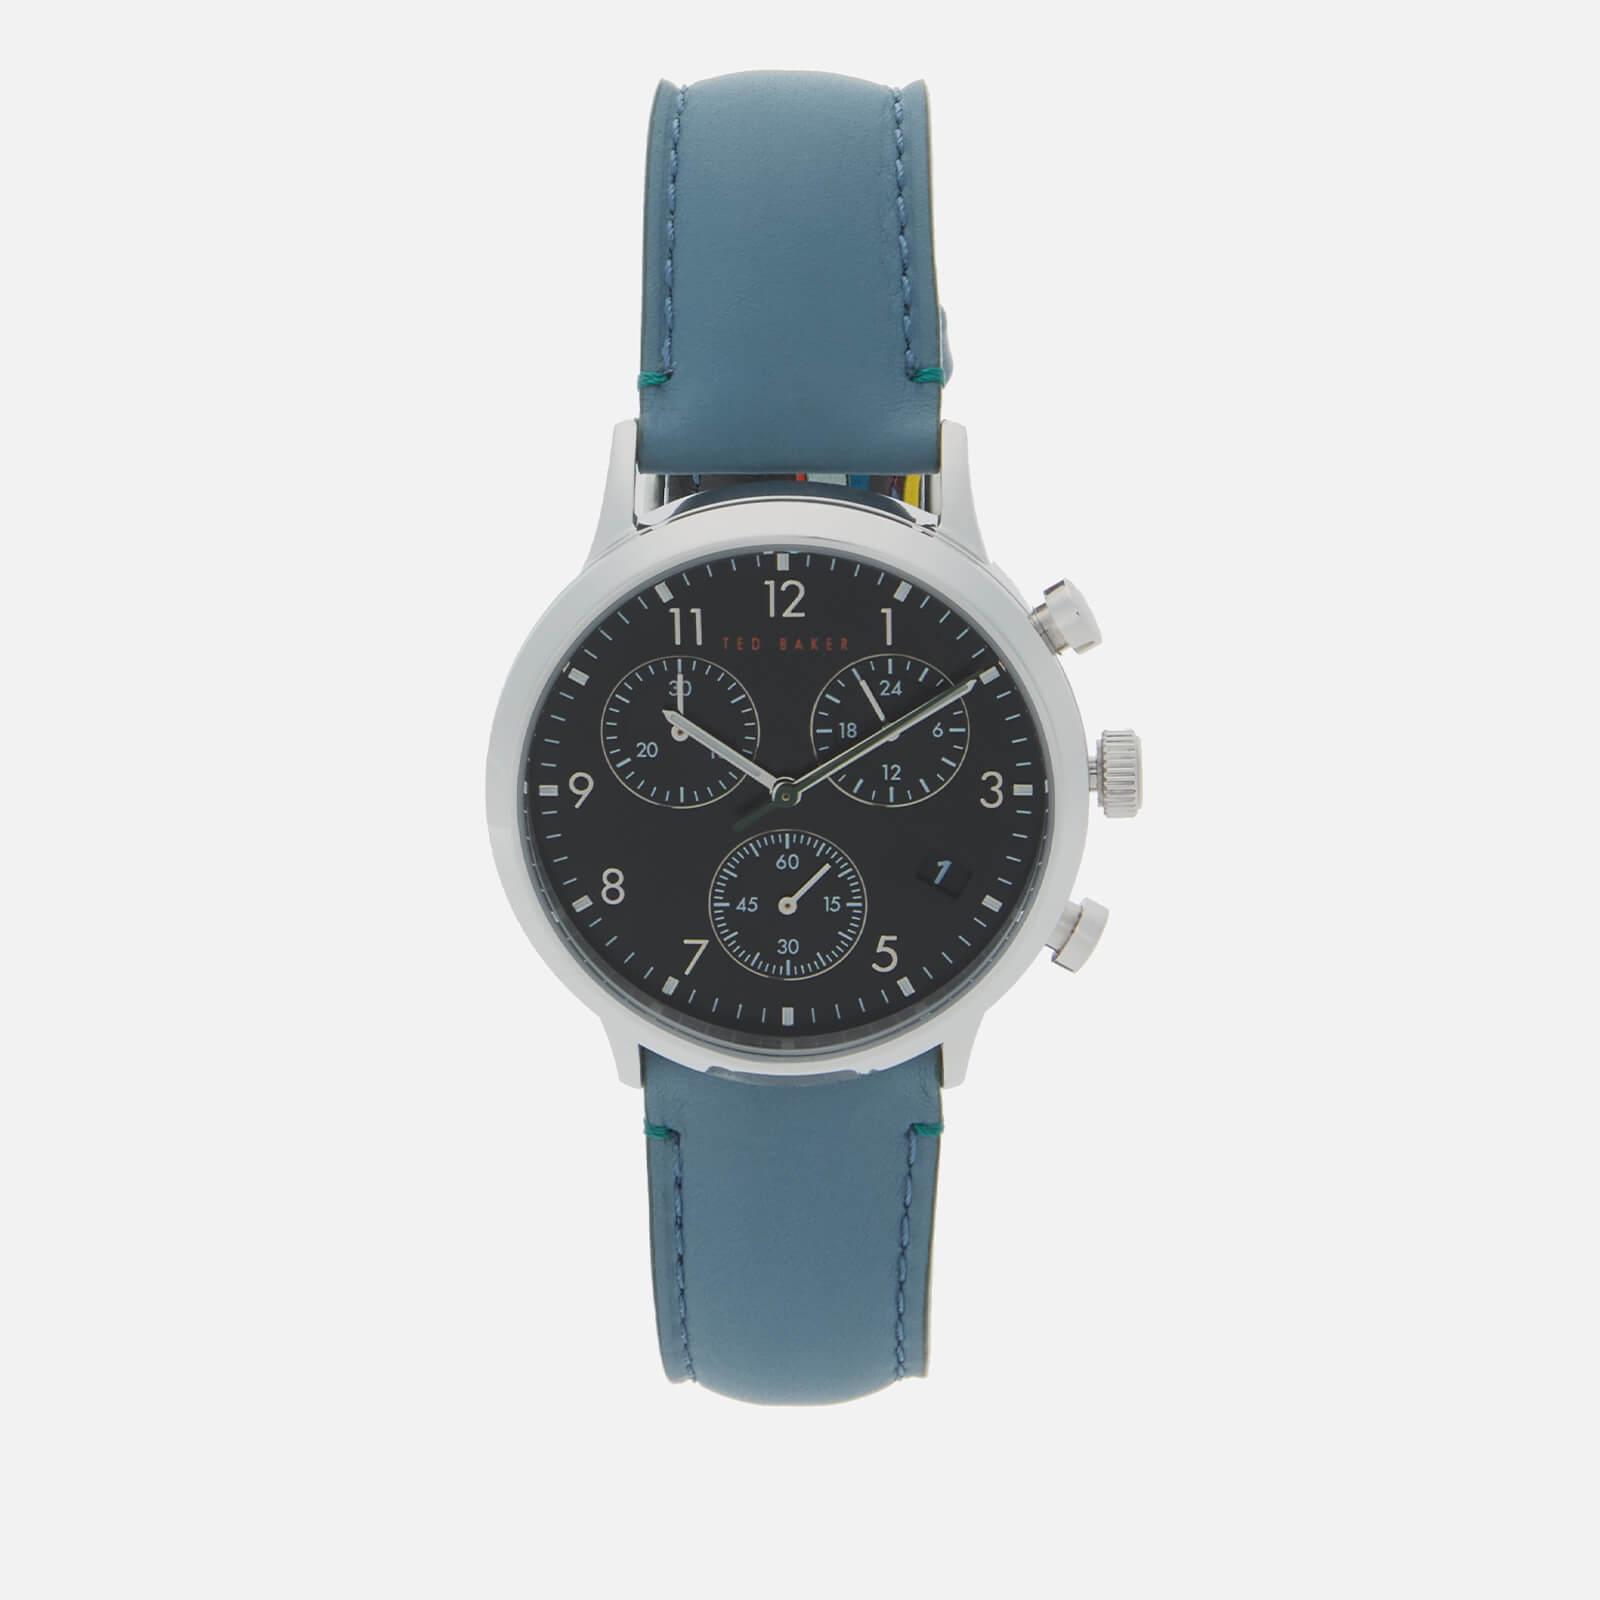 Ted Baker Men's Cosmop Chrono Watch - Black/Blue